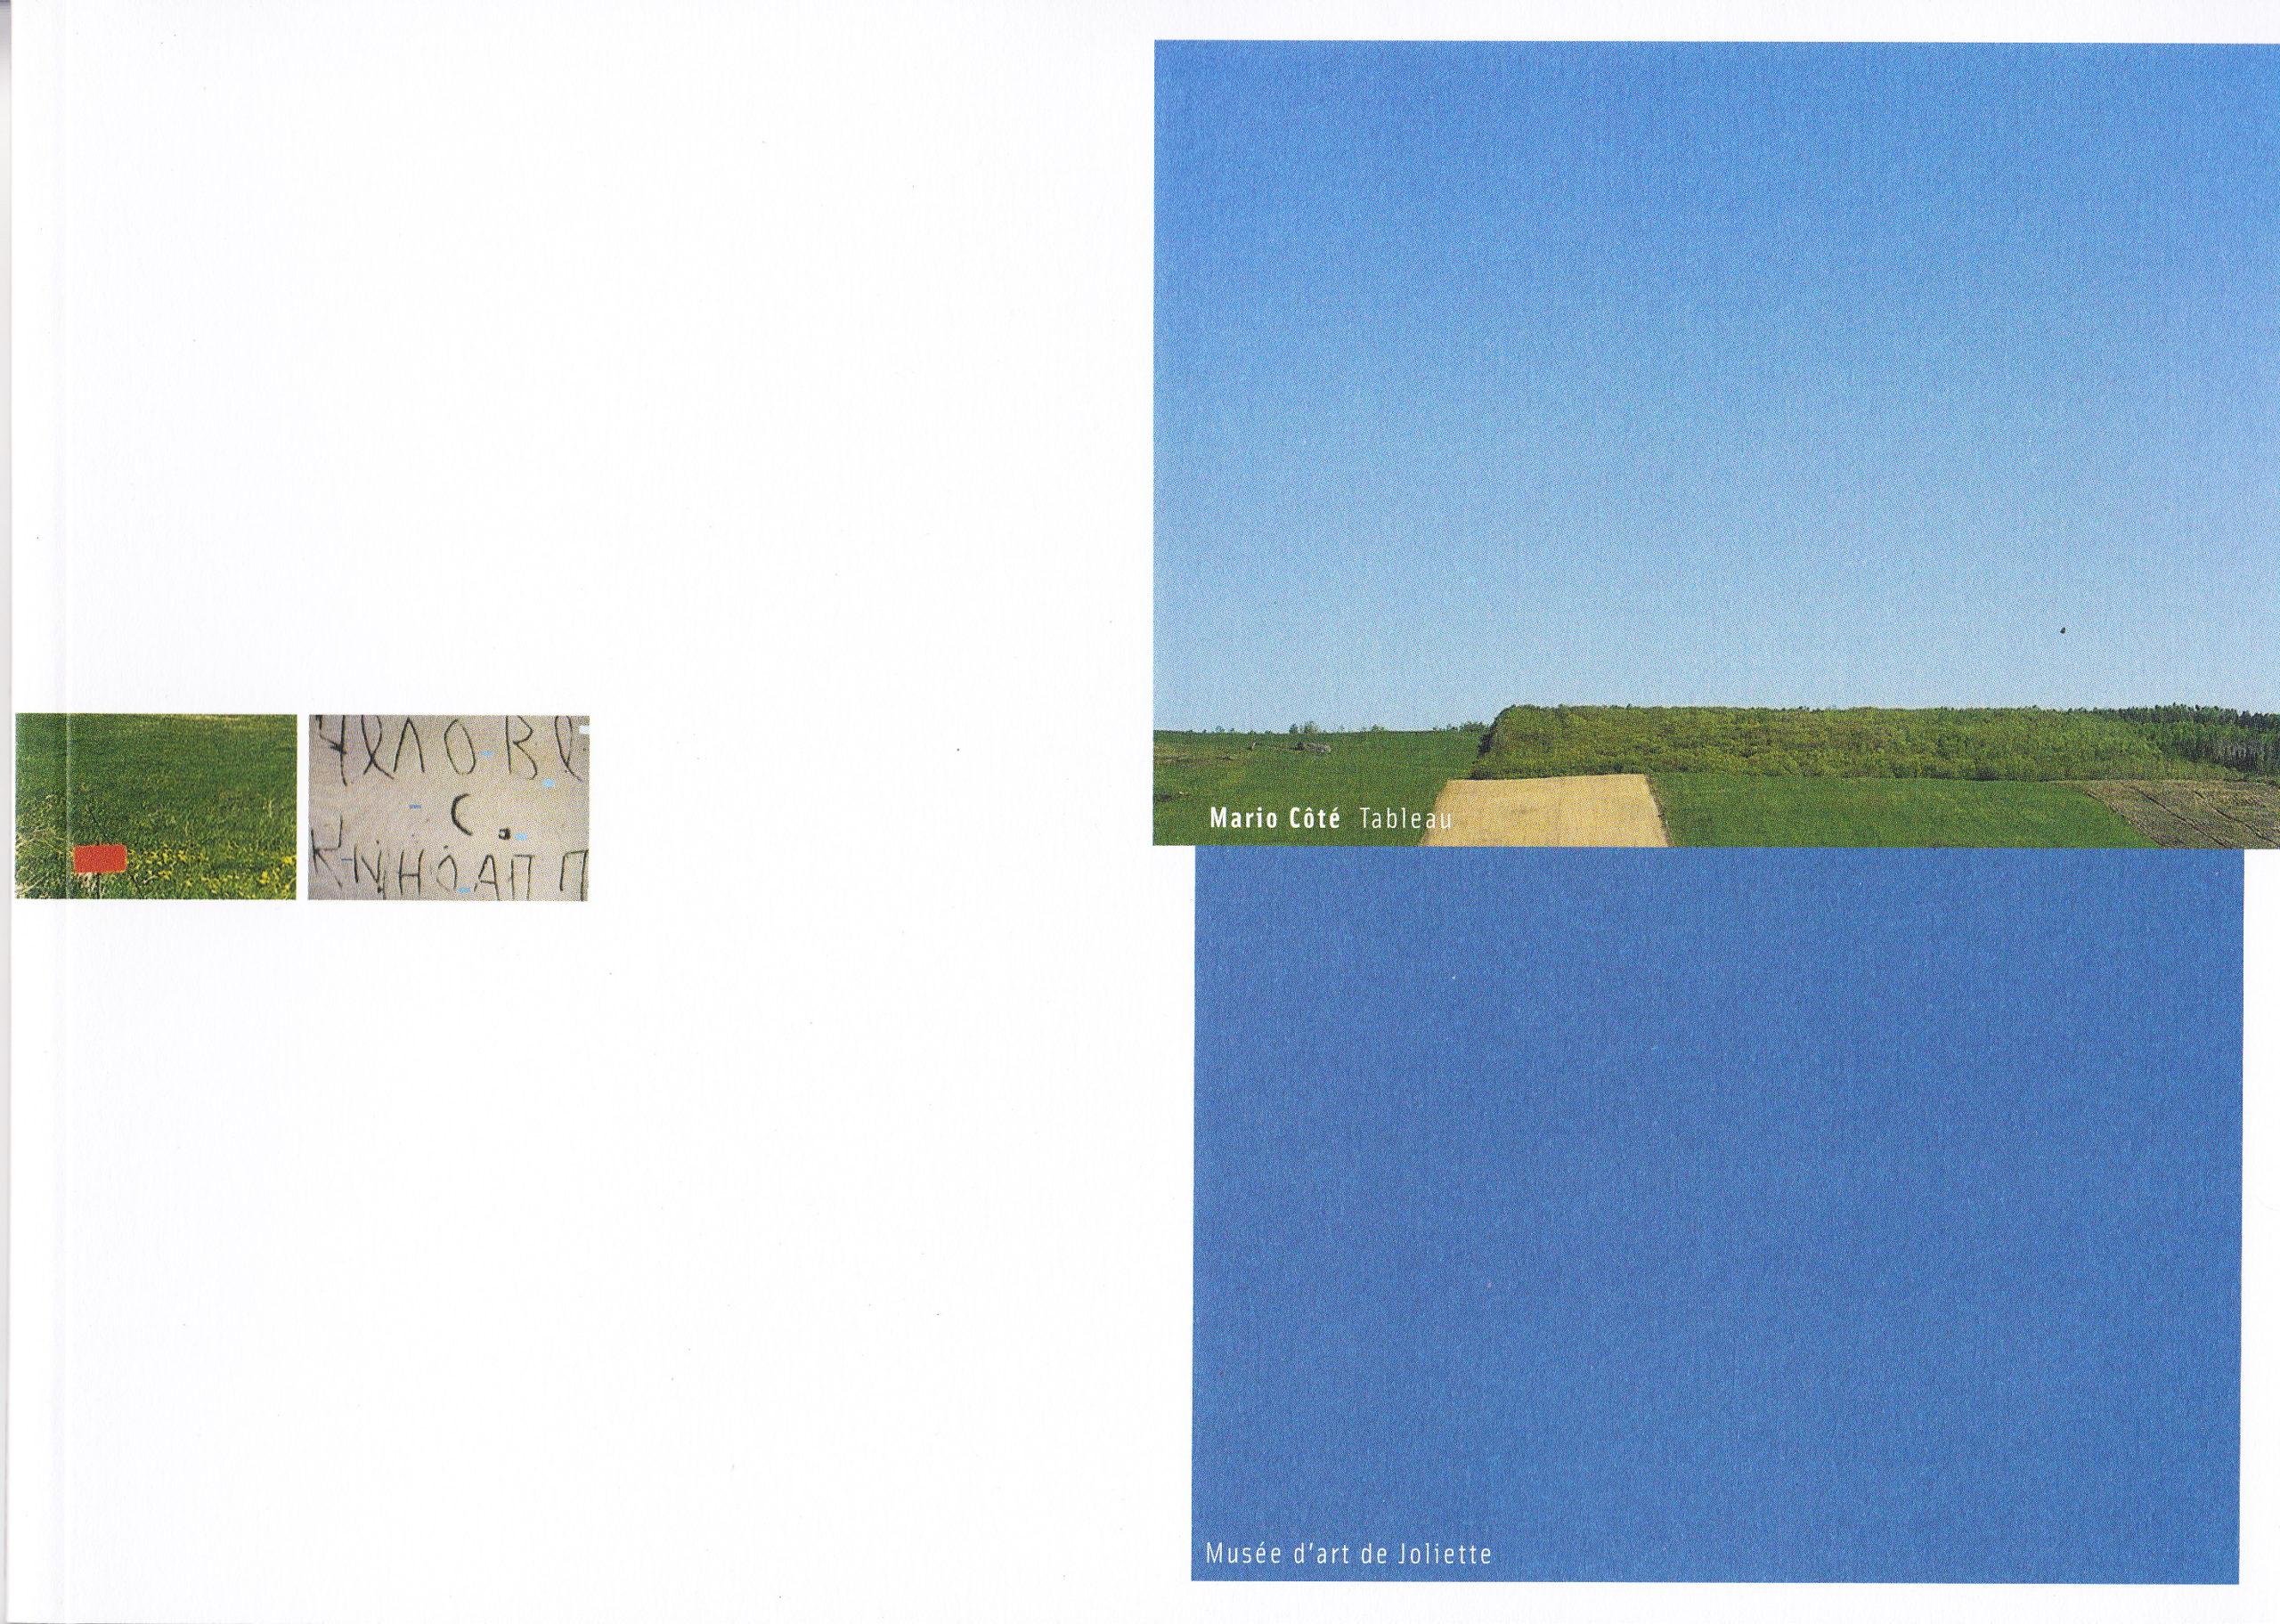 Tableau, Nicole Gingras, 2002